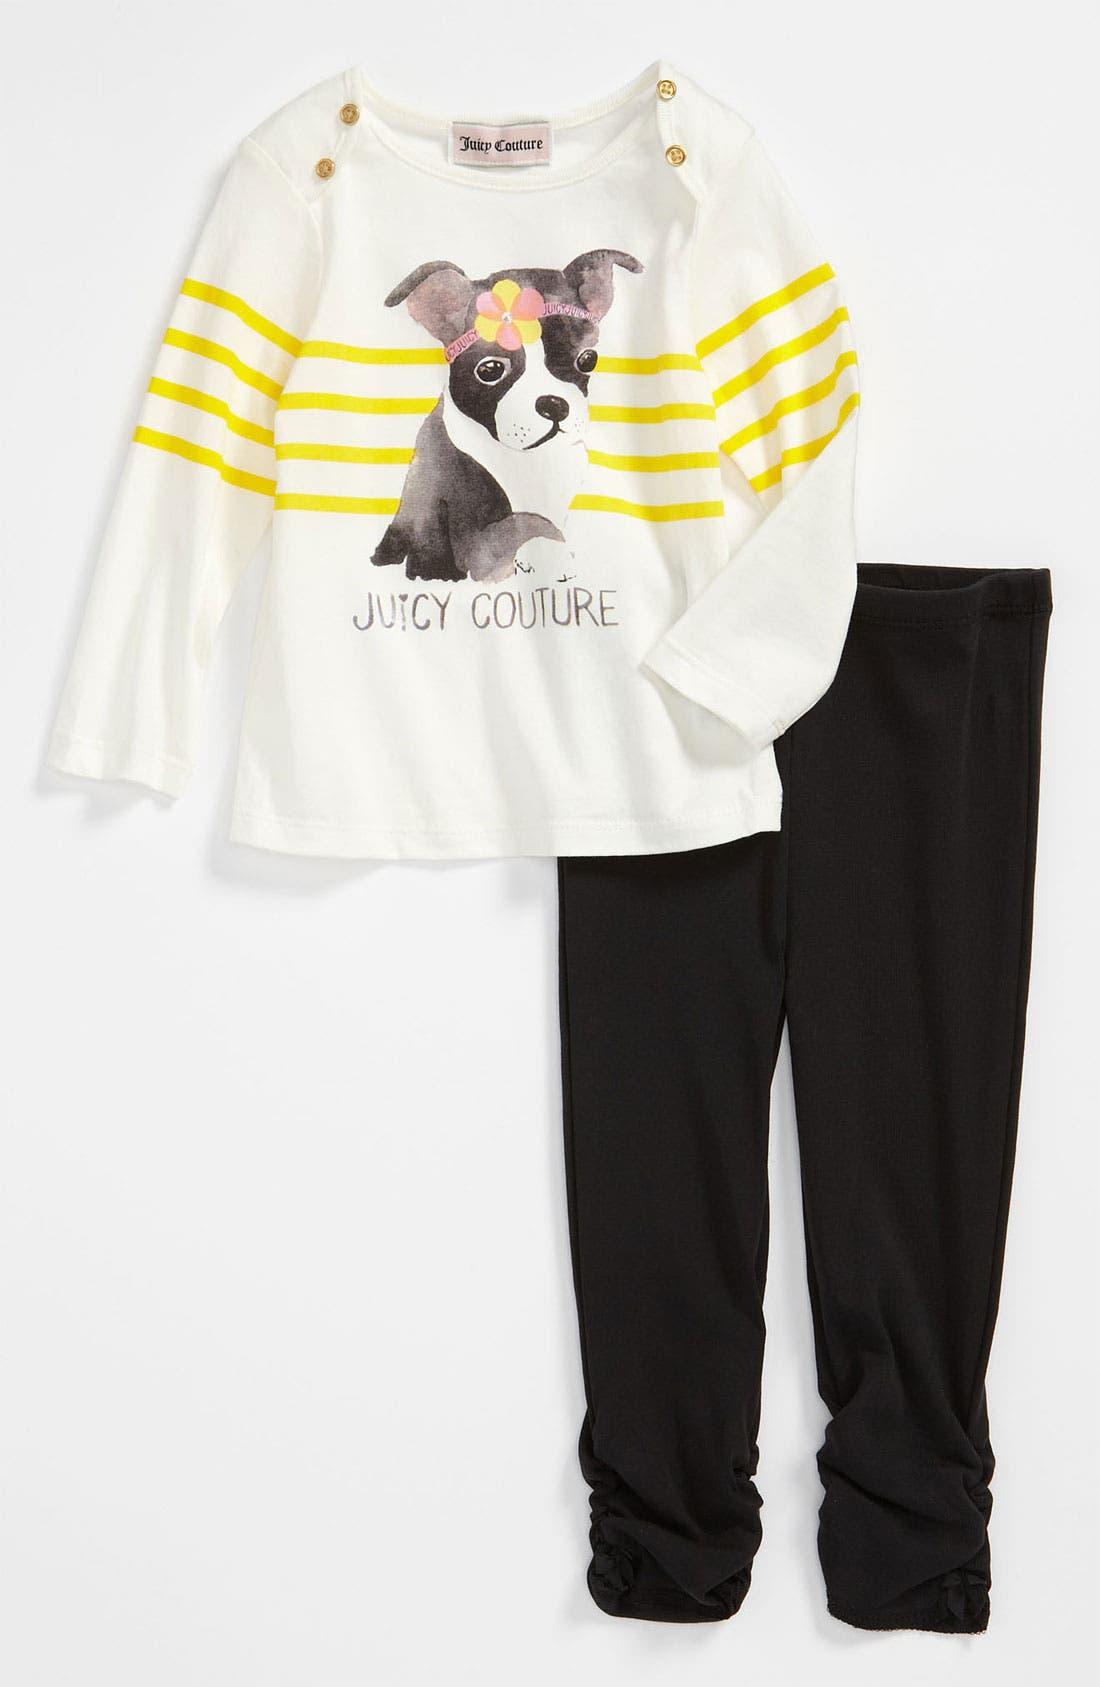 Main Image - Juicy Couture Top & Leggings (Infant)